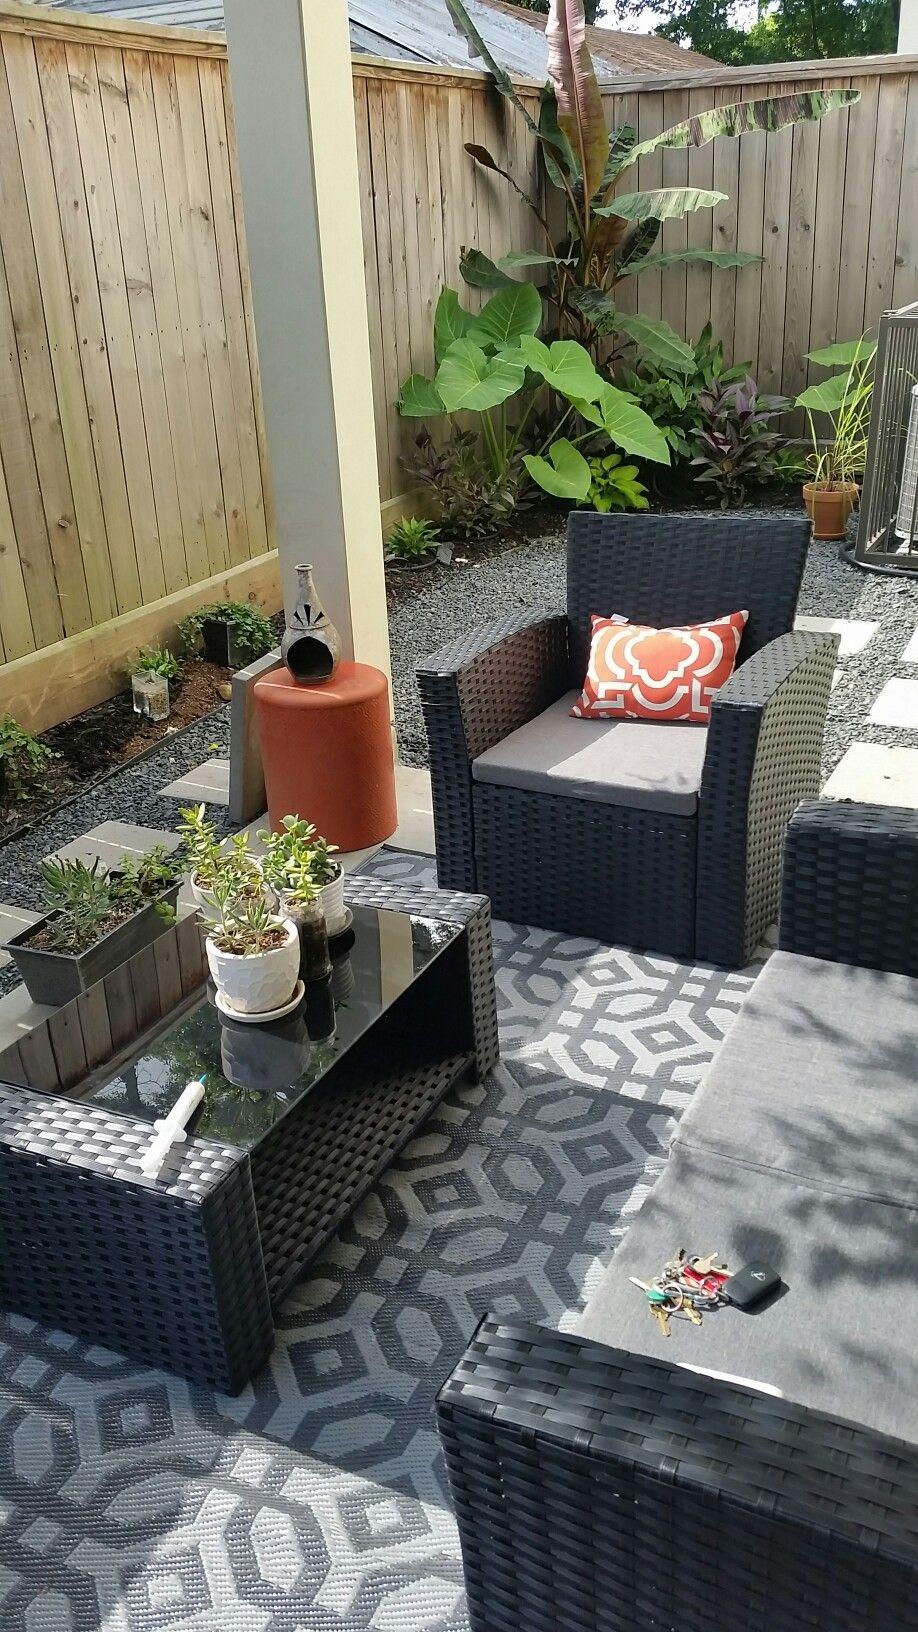 My backyard zen transformation | Outdoor decor, Outdoor ... on My Backyard Living id=46252